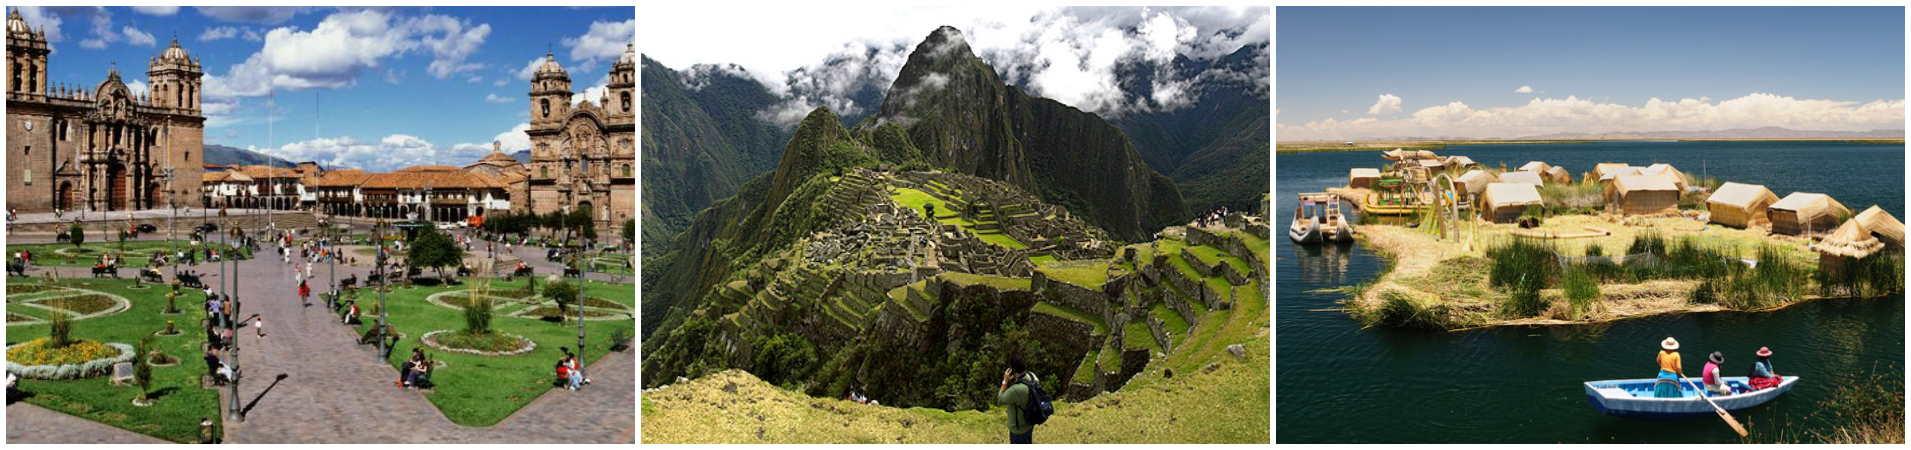 paquetes Viajes Cusco Machu Picchu Puno 6 dias